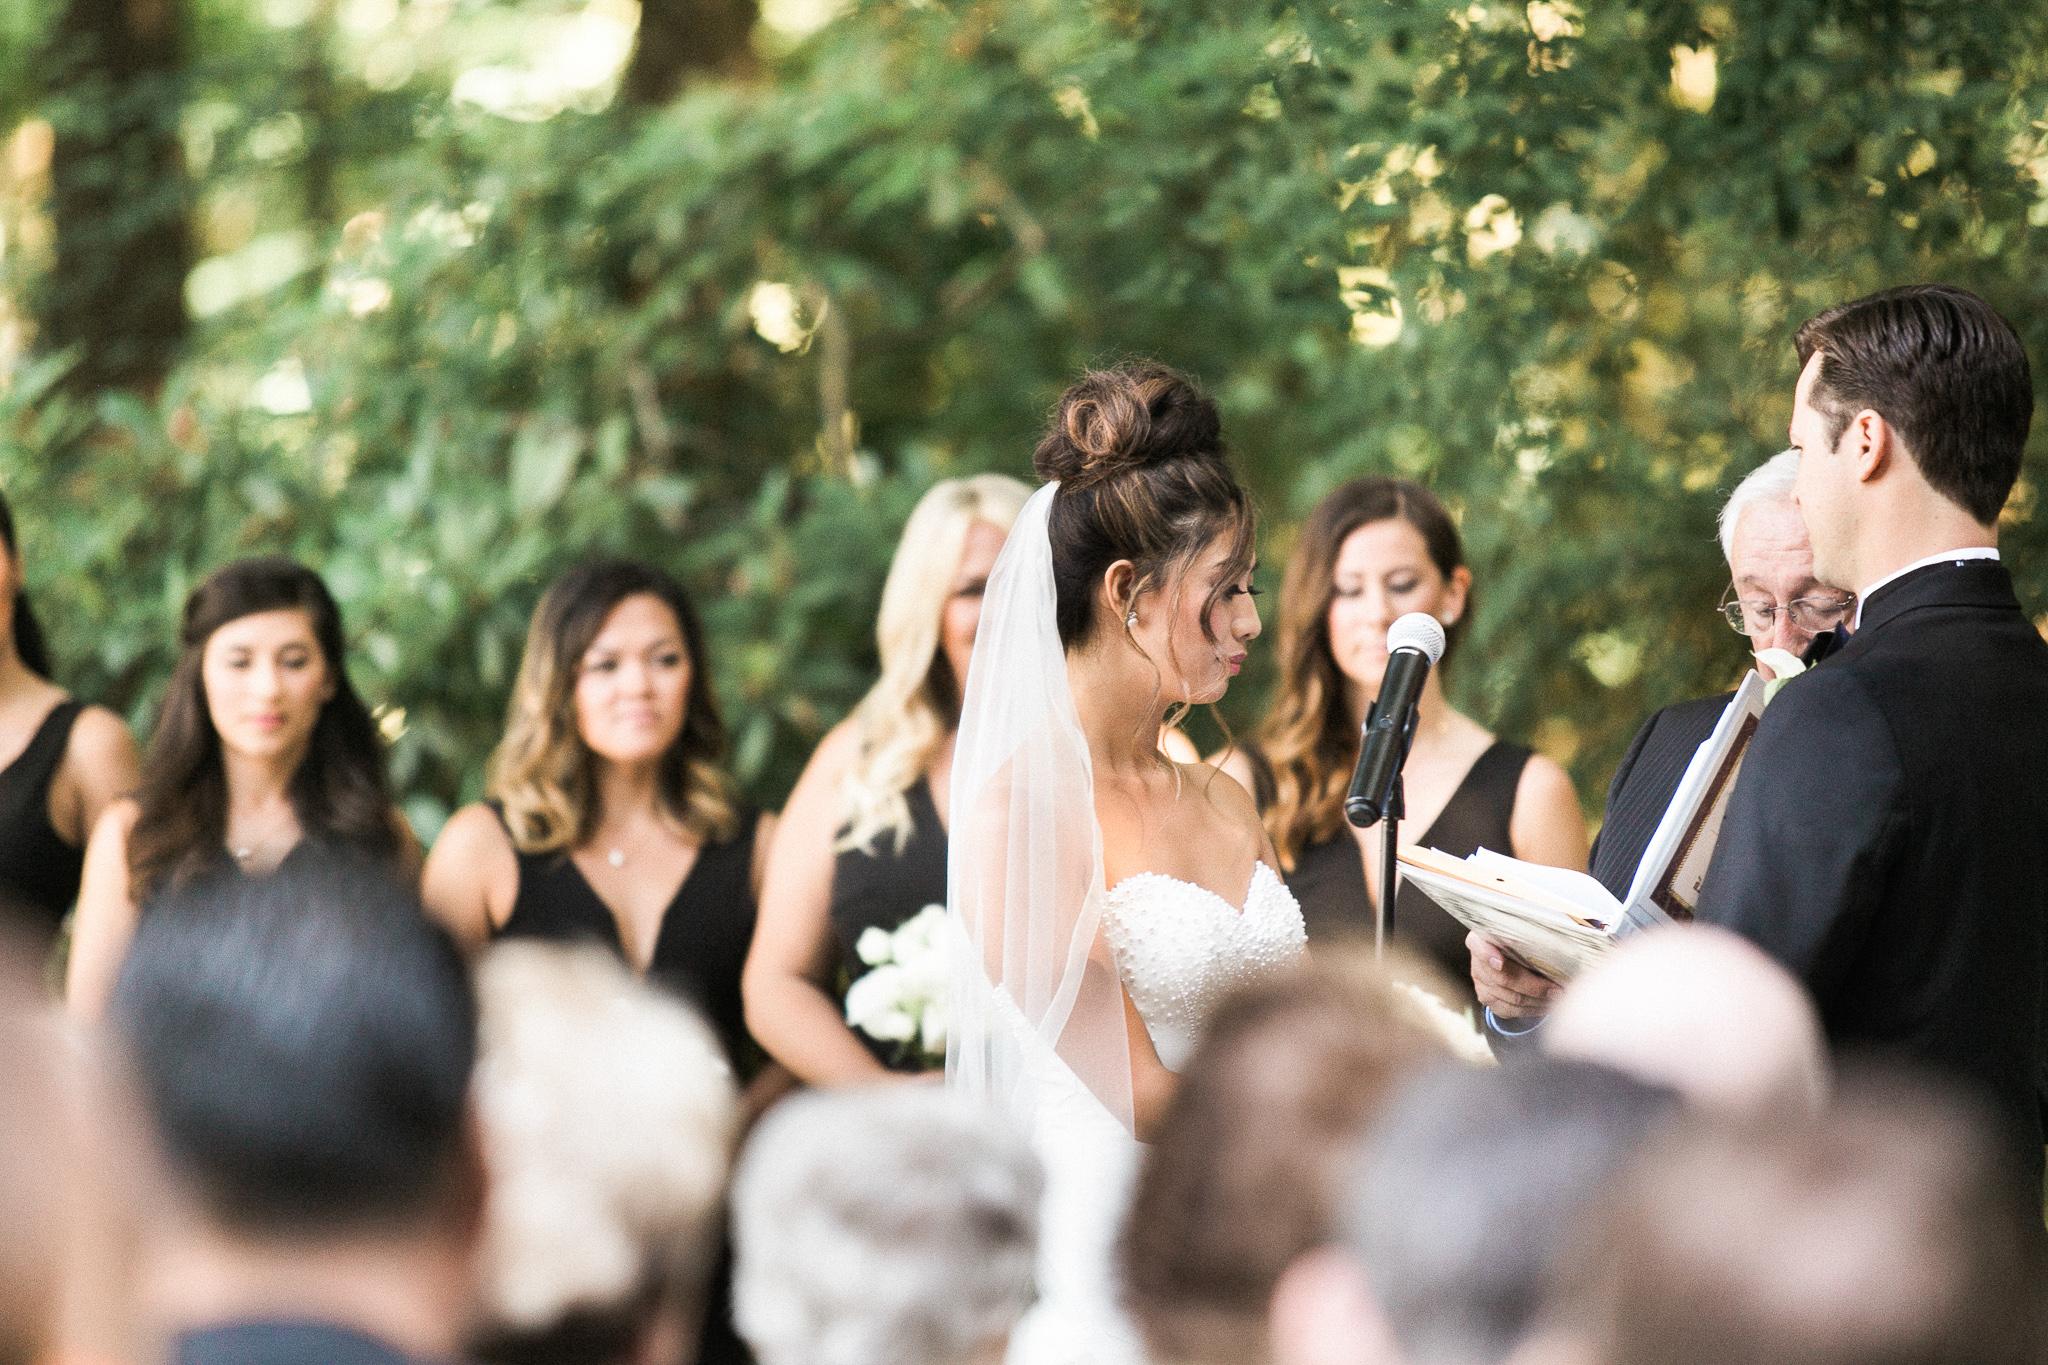 137OutliveCreative_Travel_Photographer_Videographer_Lewis&Clark_Oregon_Elegant_BlackTie_Destination_Wedding.jpg